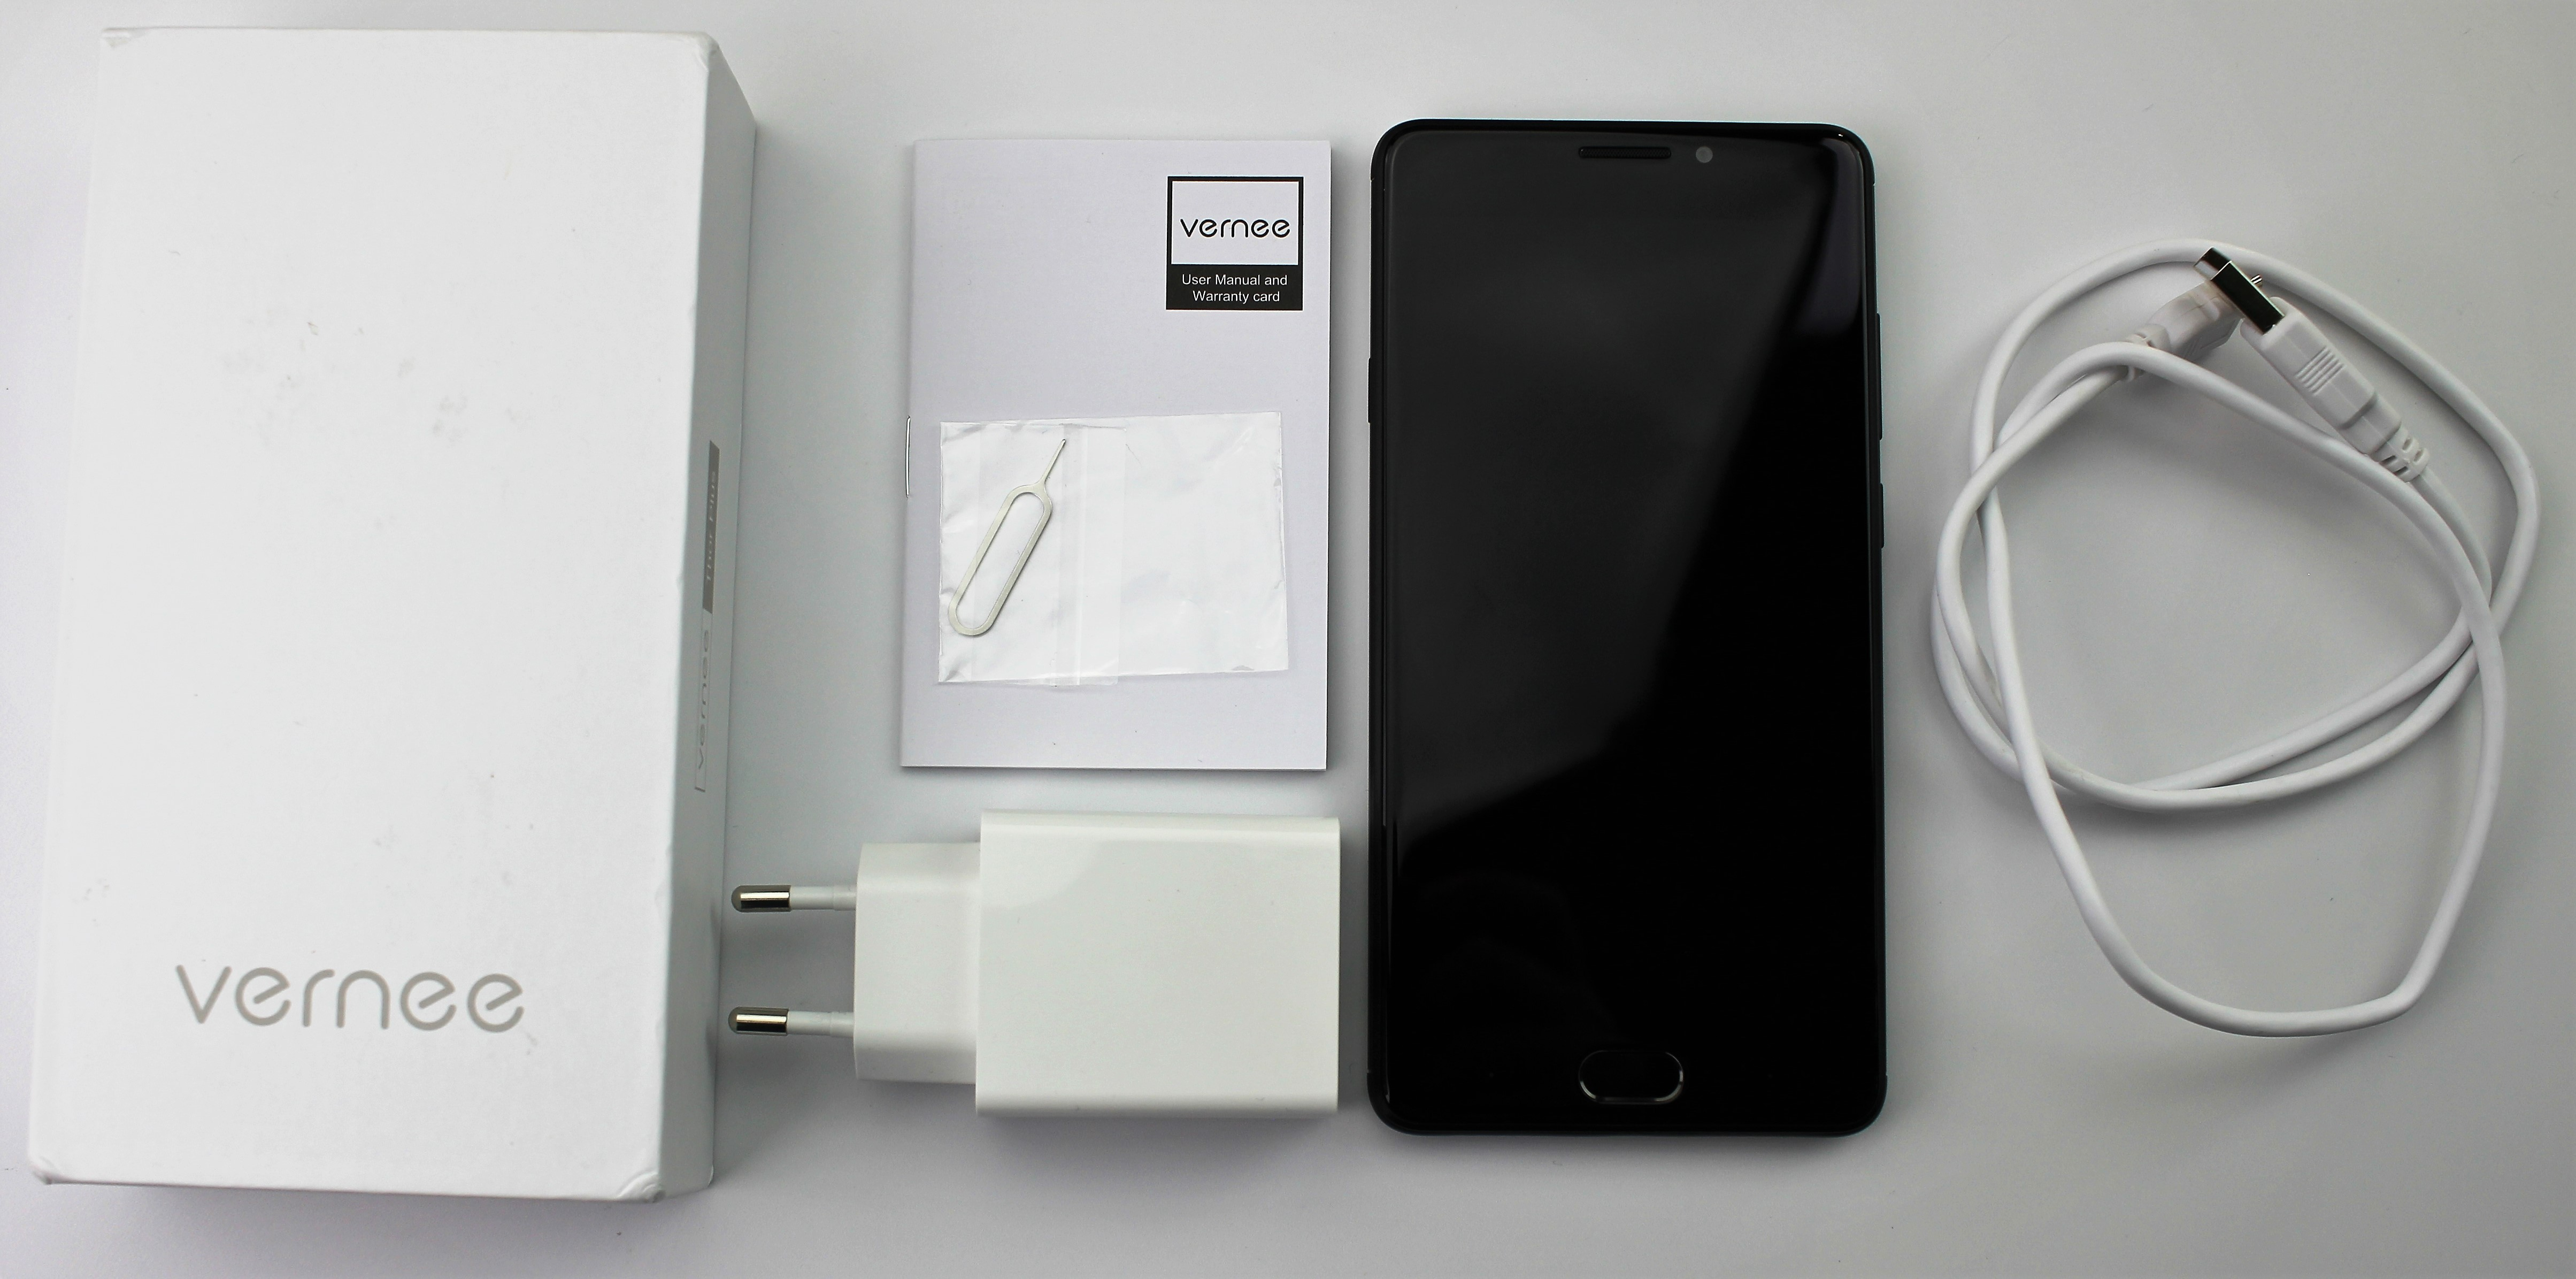 vernee thor plus mittelklasse smartphone mit mah akku. Black Bedroom Furniture Sets. Home Design Ideas